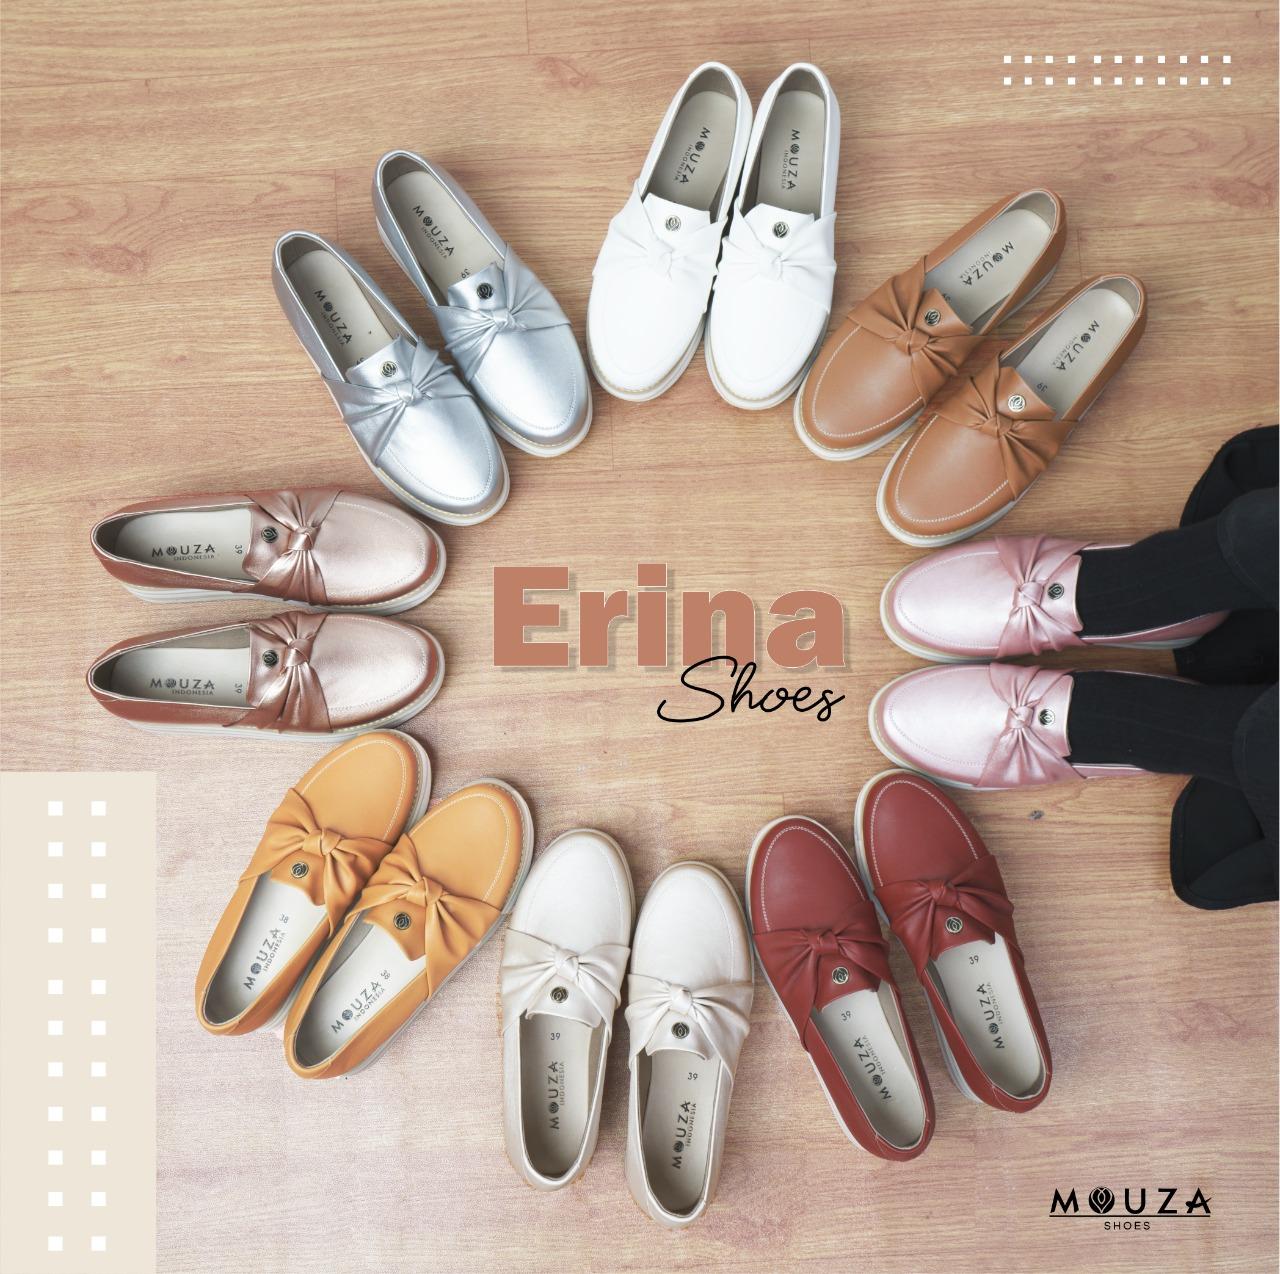 Erina Shoes